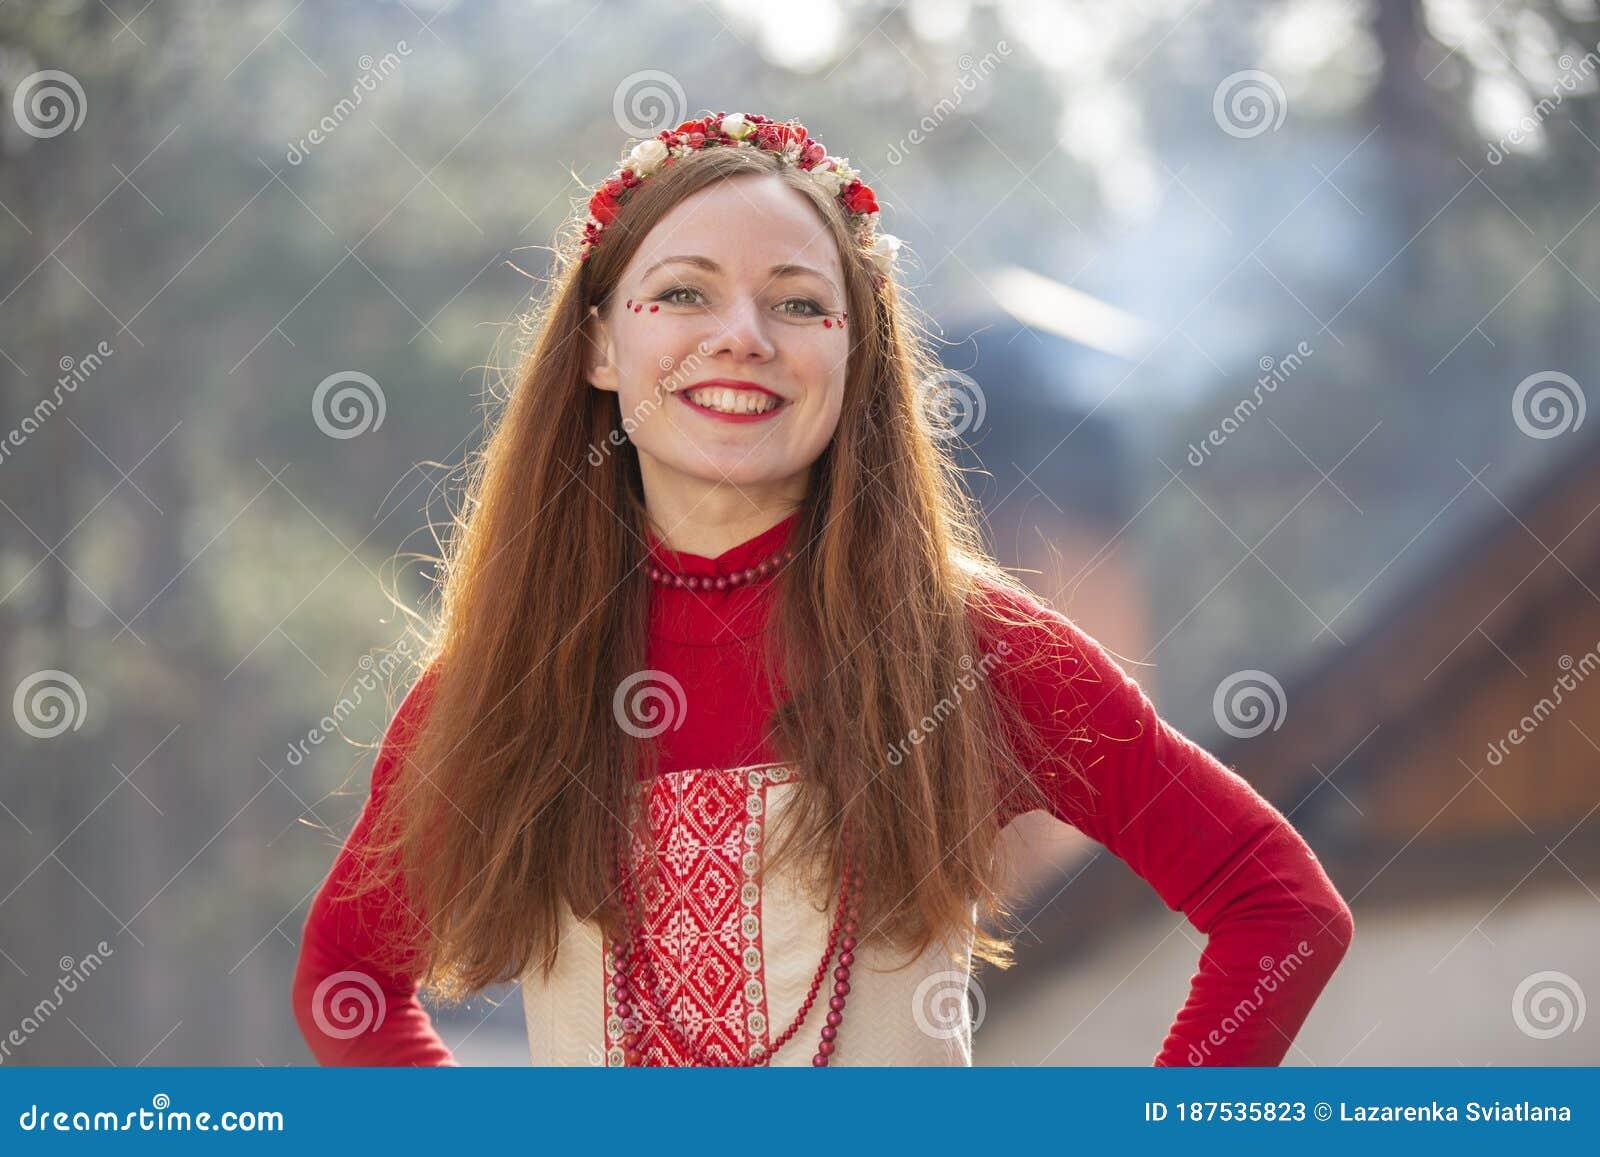 https://thumbs.dreamstime.com/z/belarus-city-gomel-march-celebration-maslenitsa-seeing-off-winter-russian-girl-national-clothes-belarussian-woman-187535823.jpg